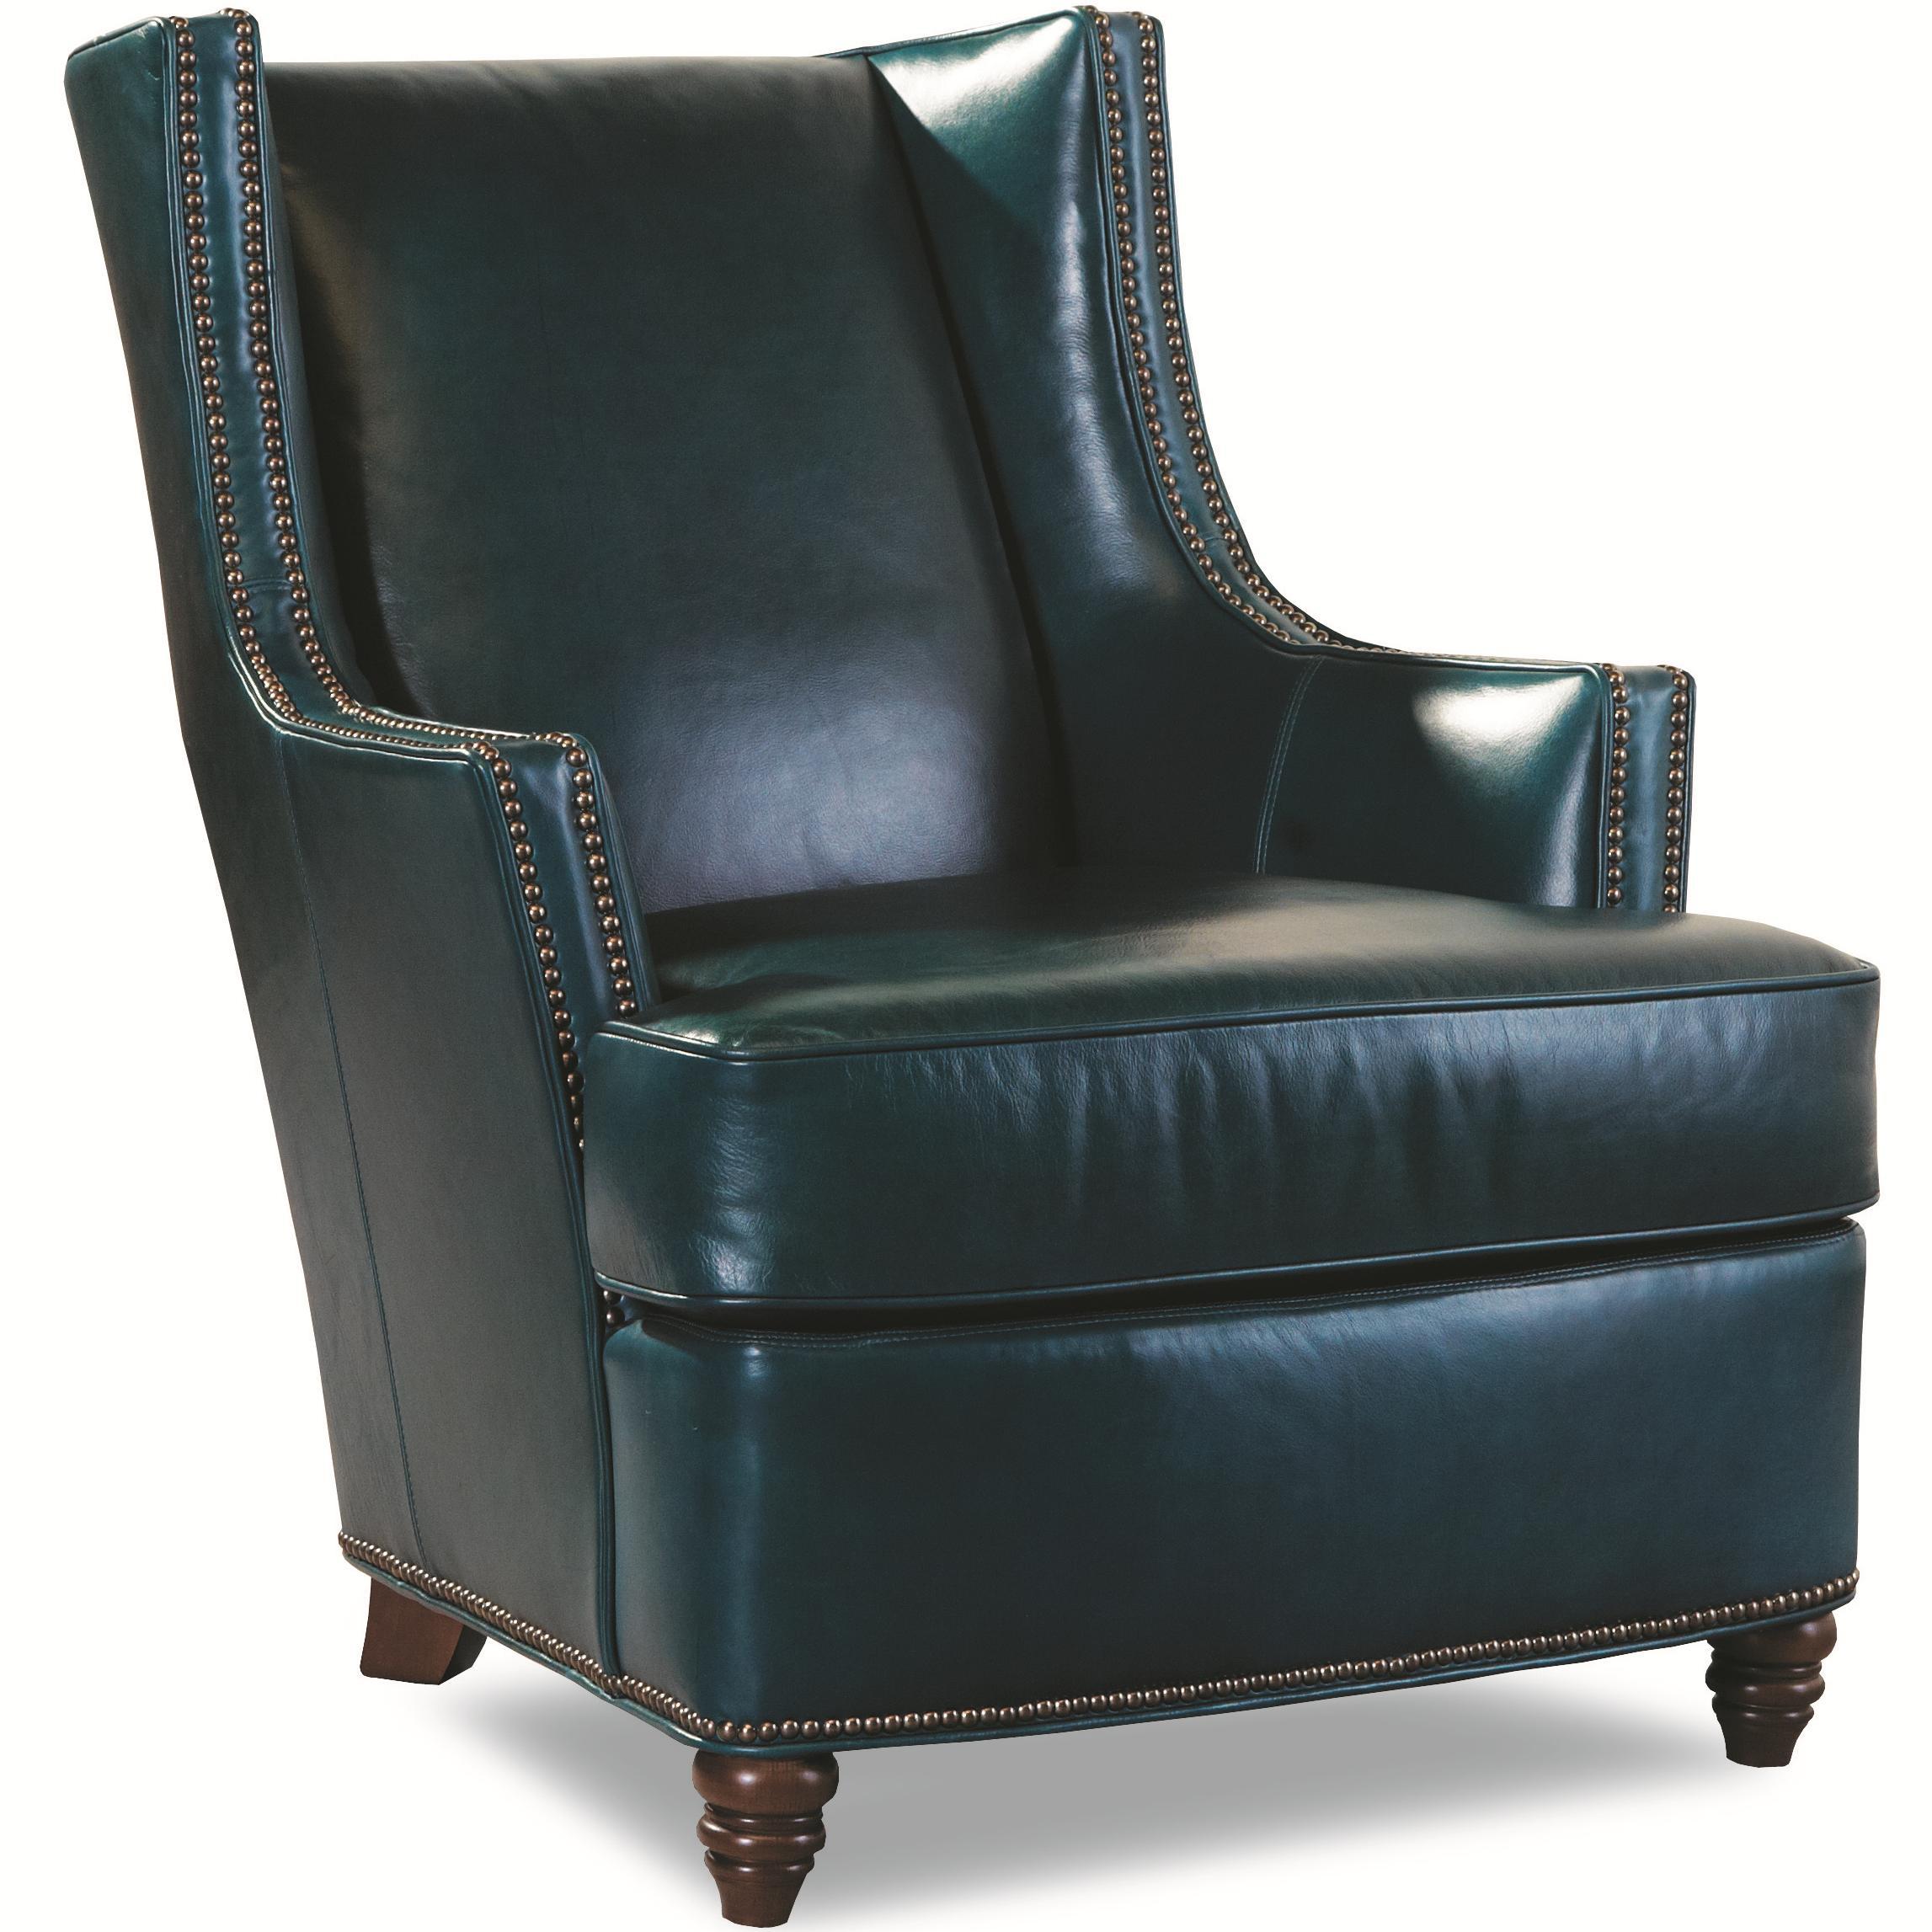 7499 Traditional Chair by Geoffrey Alexander at Sprintz Furniture